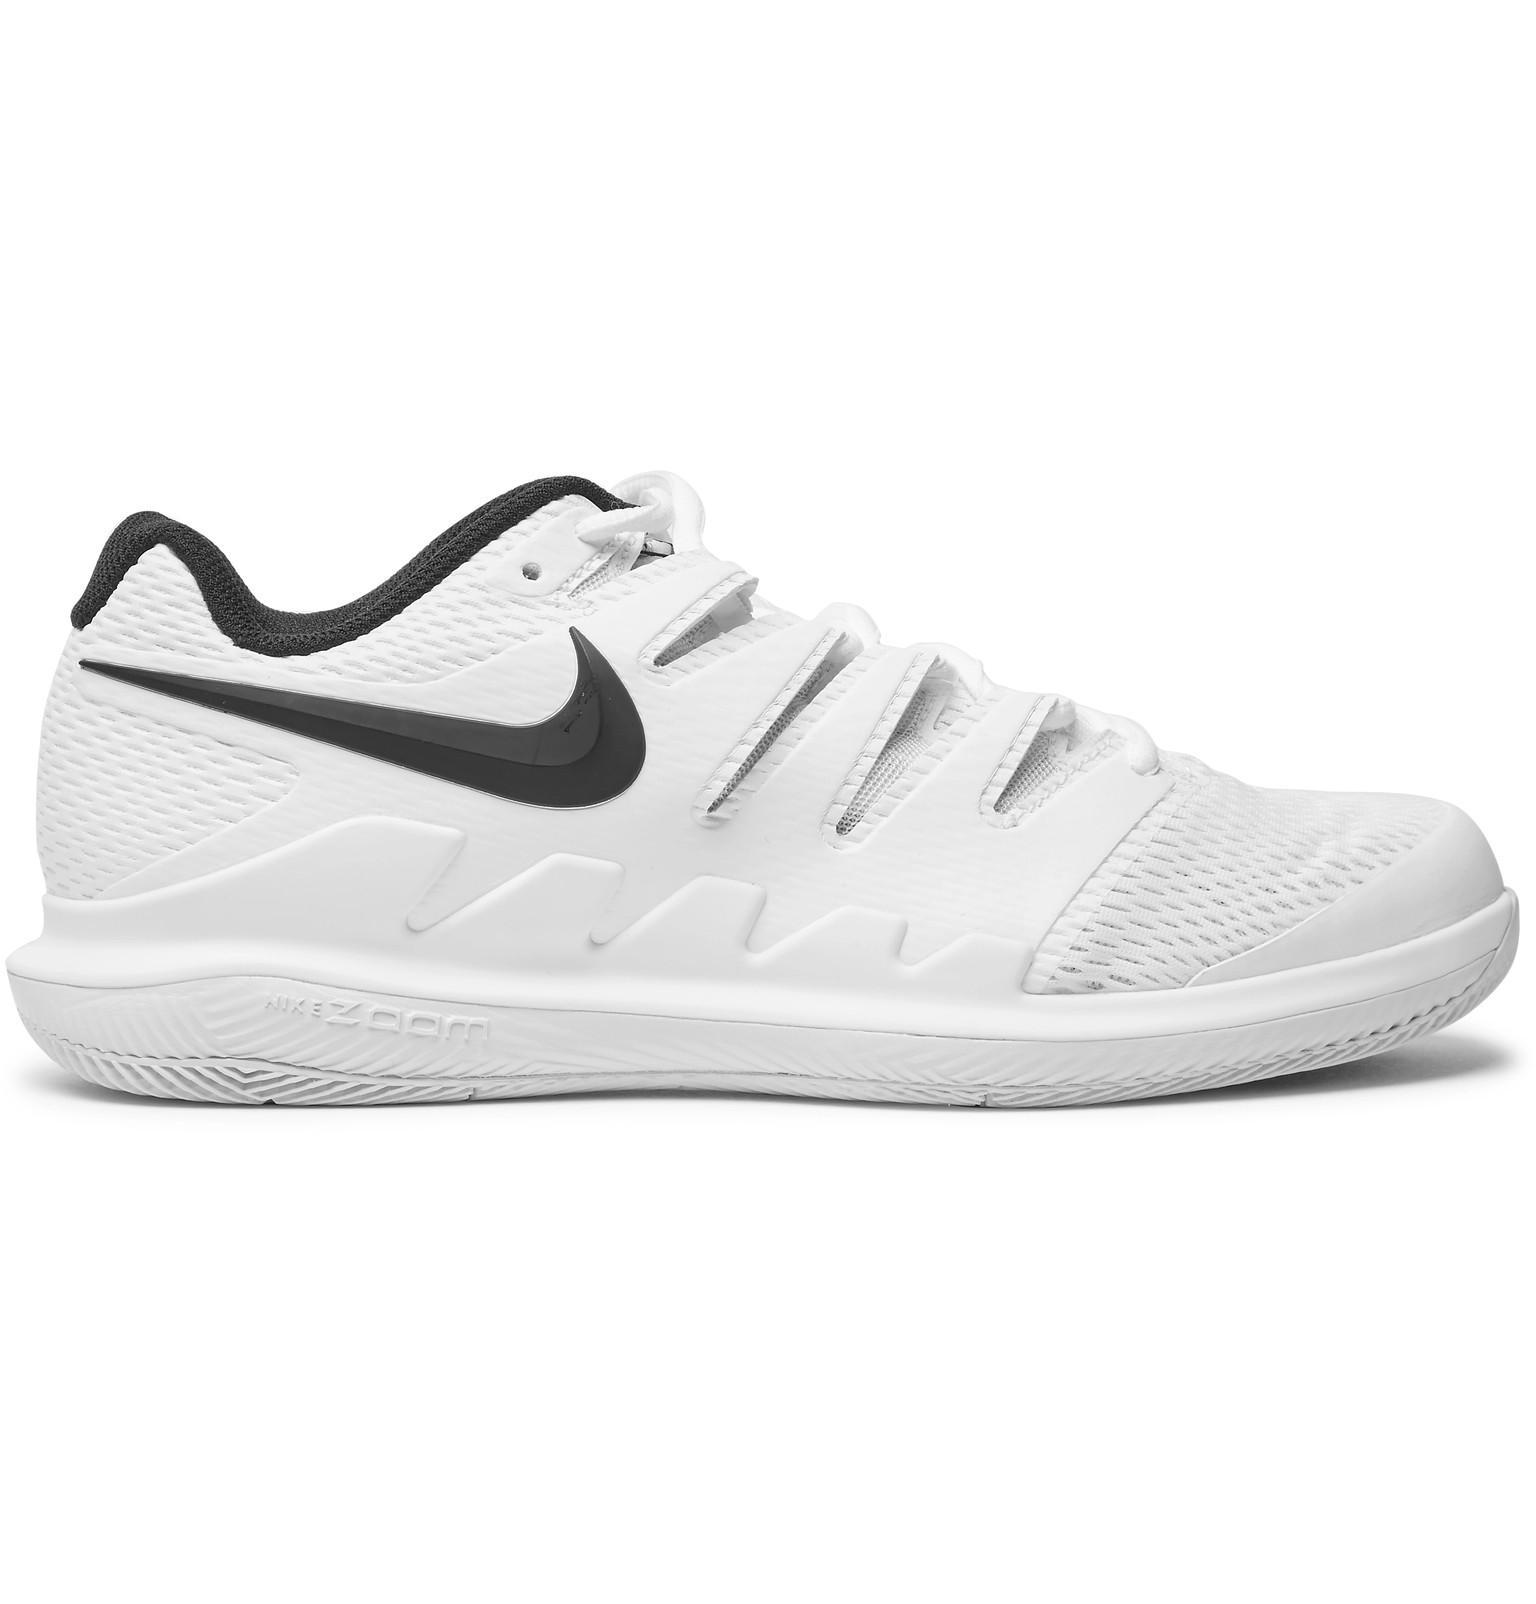 Air Zoom Vapor X Rubber And Mesh Sneakers Nike RetBHFiZqb